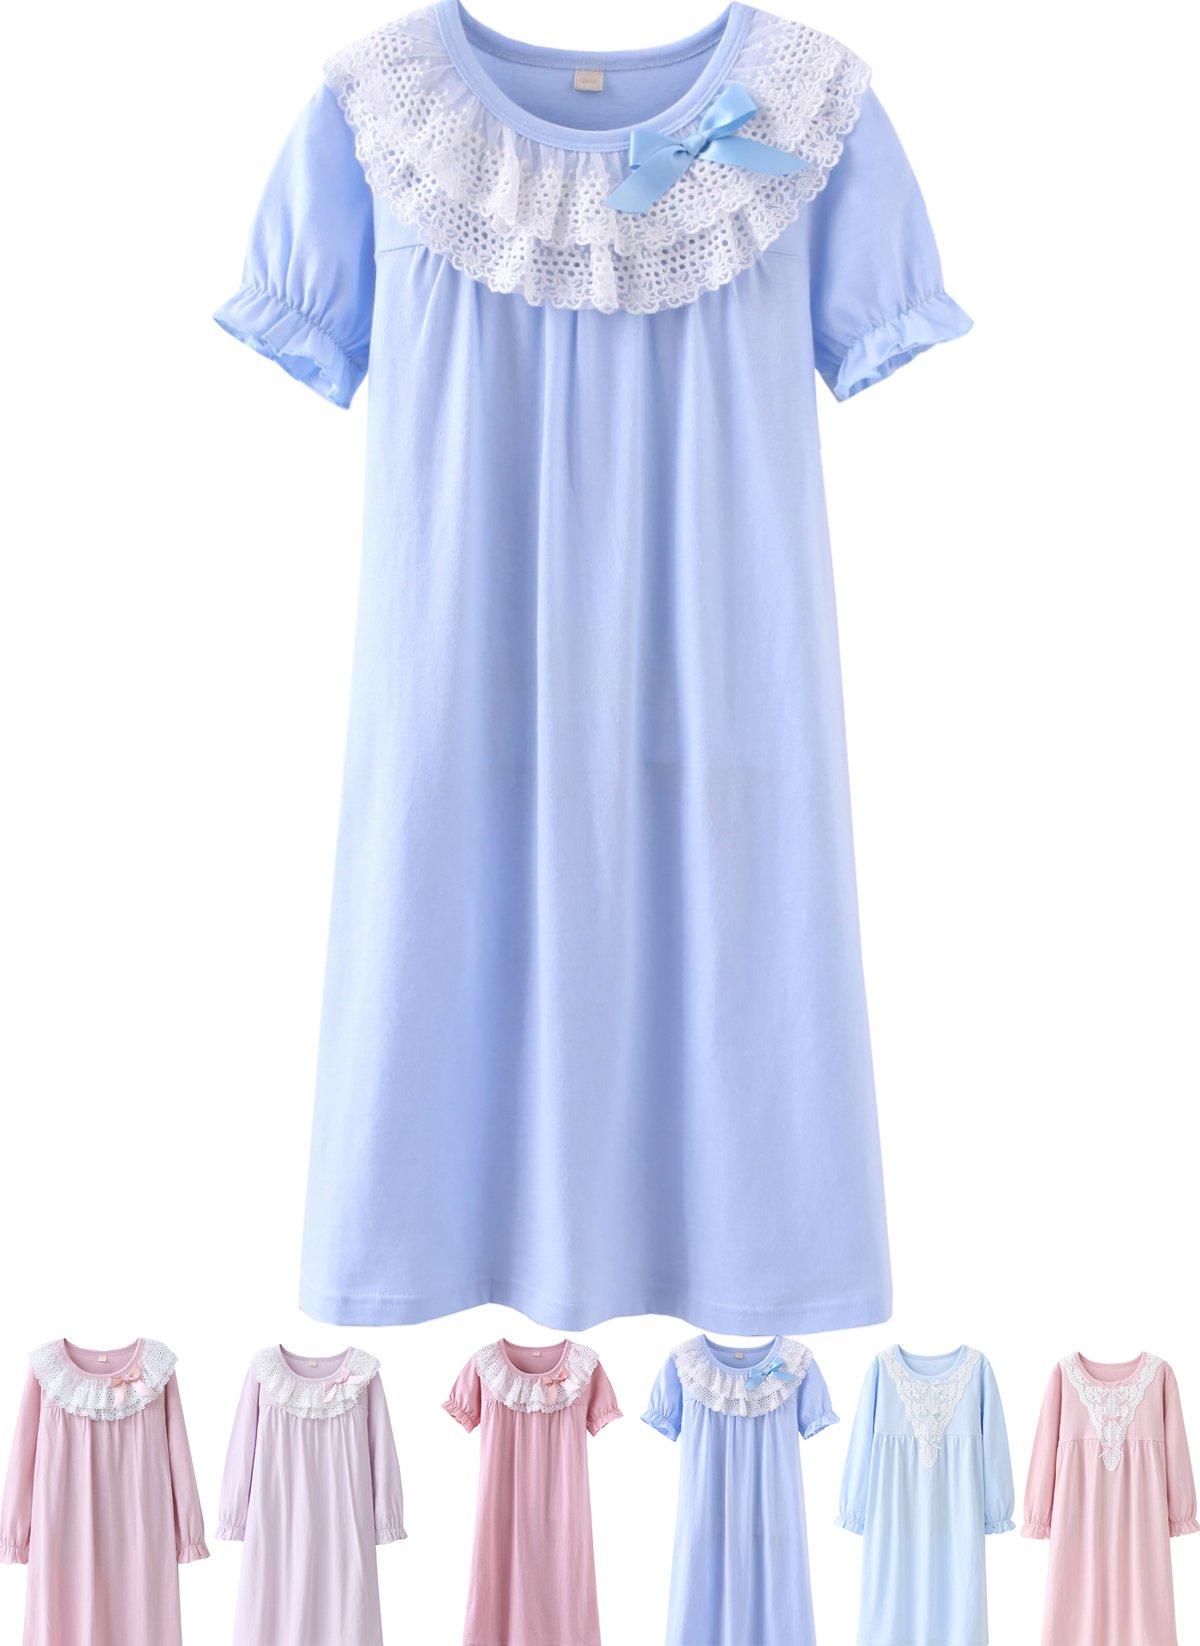 Abalaco Girls Kids Princess Lace Bowknot Nightgown Long Sleeve Cotton Sleepwear Dress Pretty Homewear Dress (16-17 Years, Blue/Short)